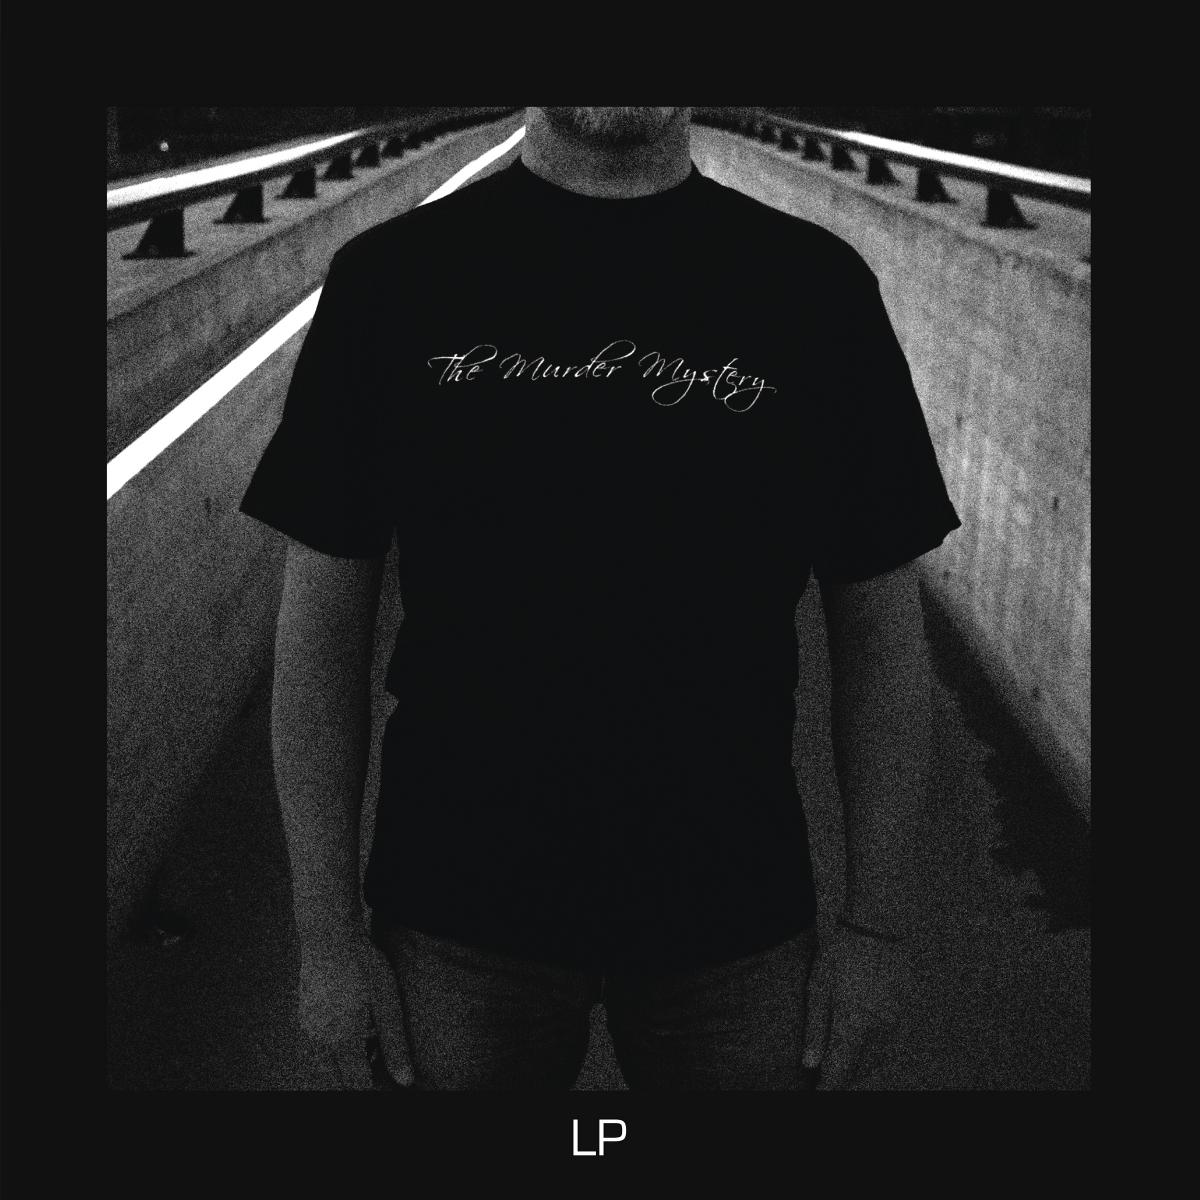 The Murder Mystery, LP